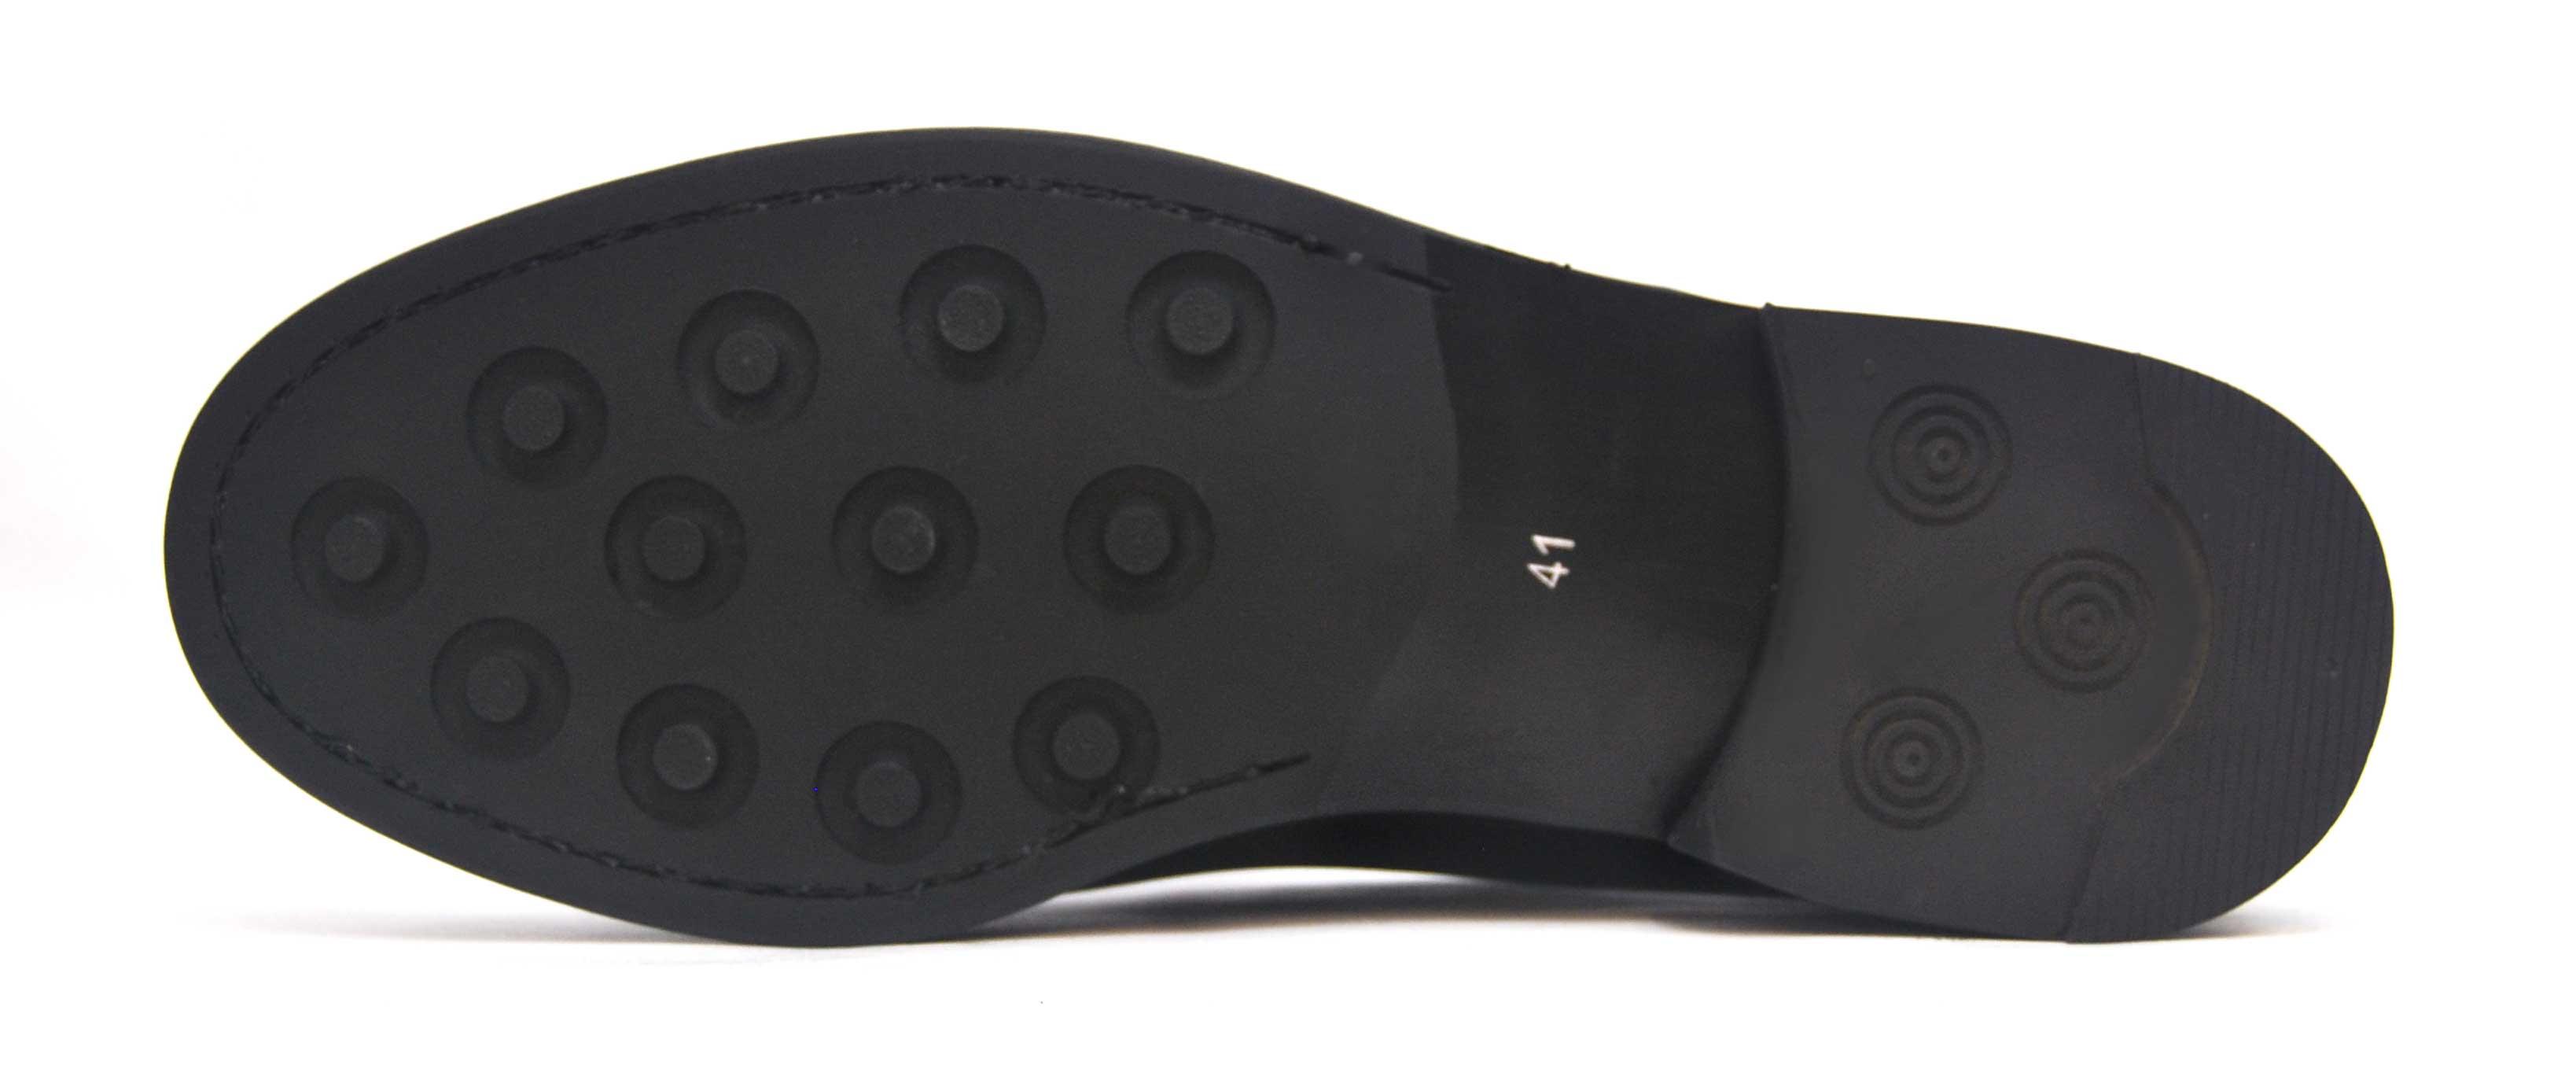 Foto 3 de Zapato Castellano 102 Liso Negro Botones